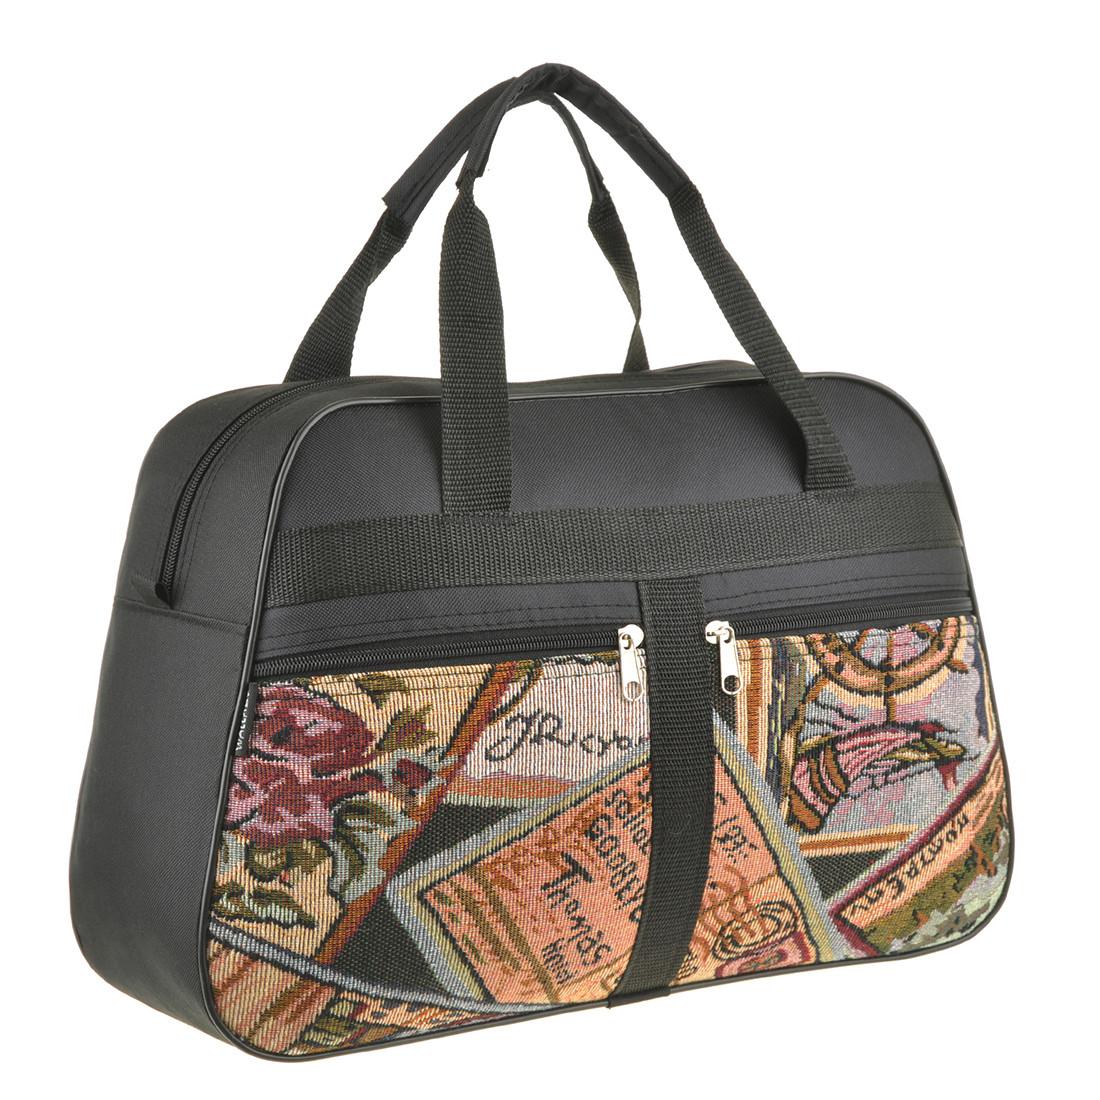 Хозяйственная сумка Wallaby 39х28х12 ткань полиестер на ПВХ основе вставка из гобелена в 270312